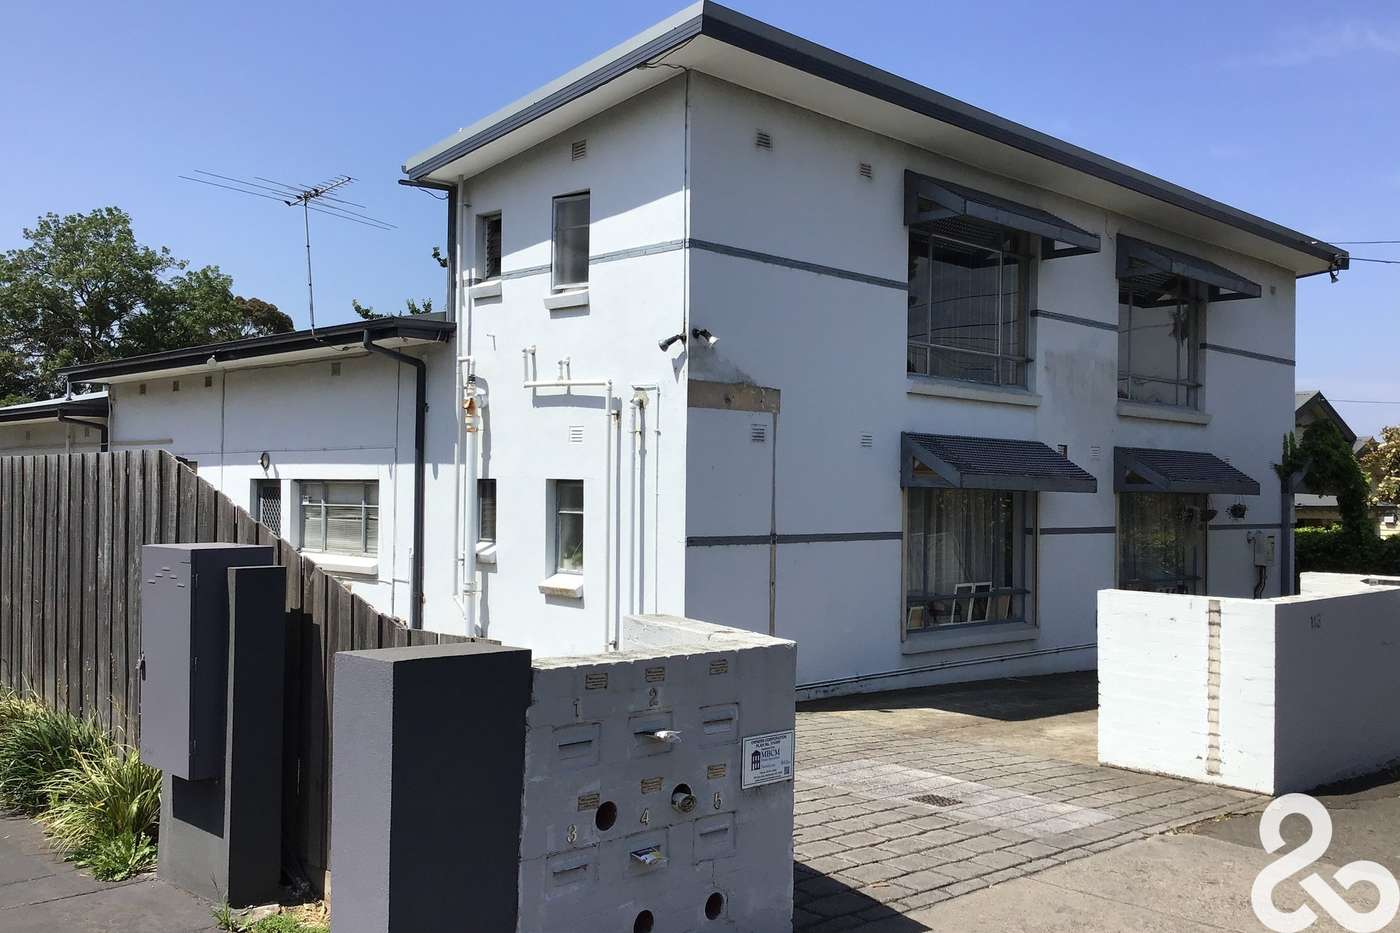 Main view of Homely unit listing, 6/113 Darebin Road, Thornbury, VIC 3071